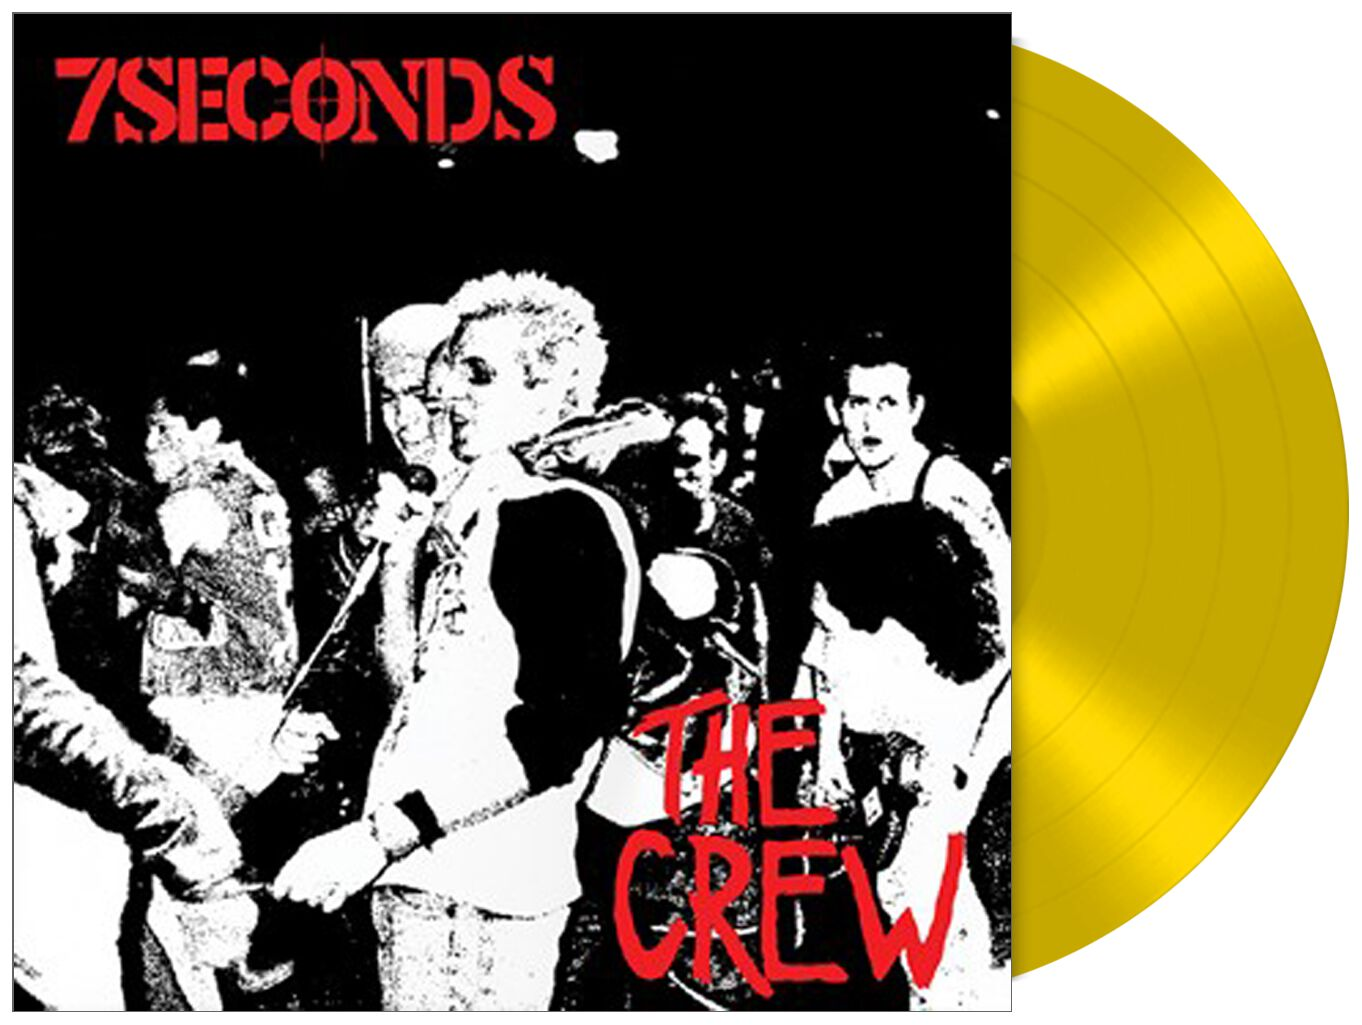 Image of 7 Seconds The crew LP gelb